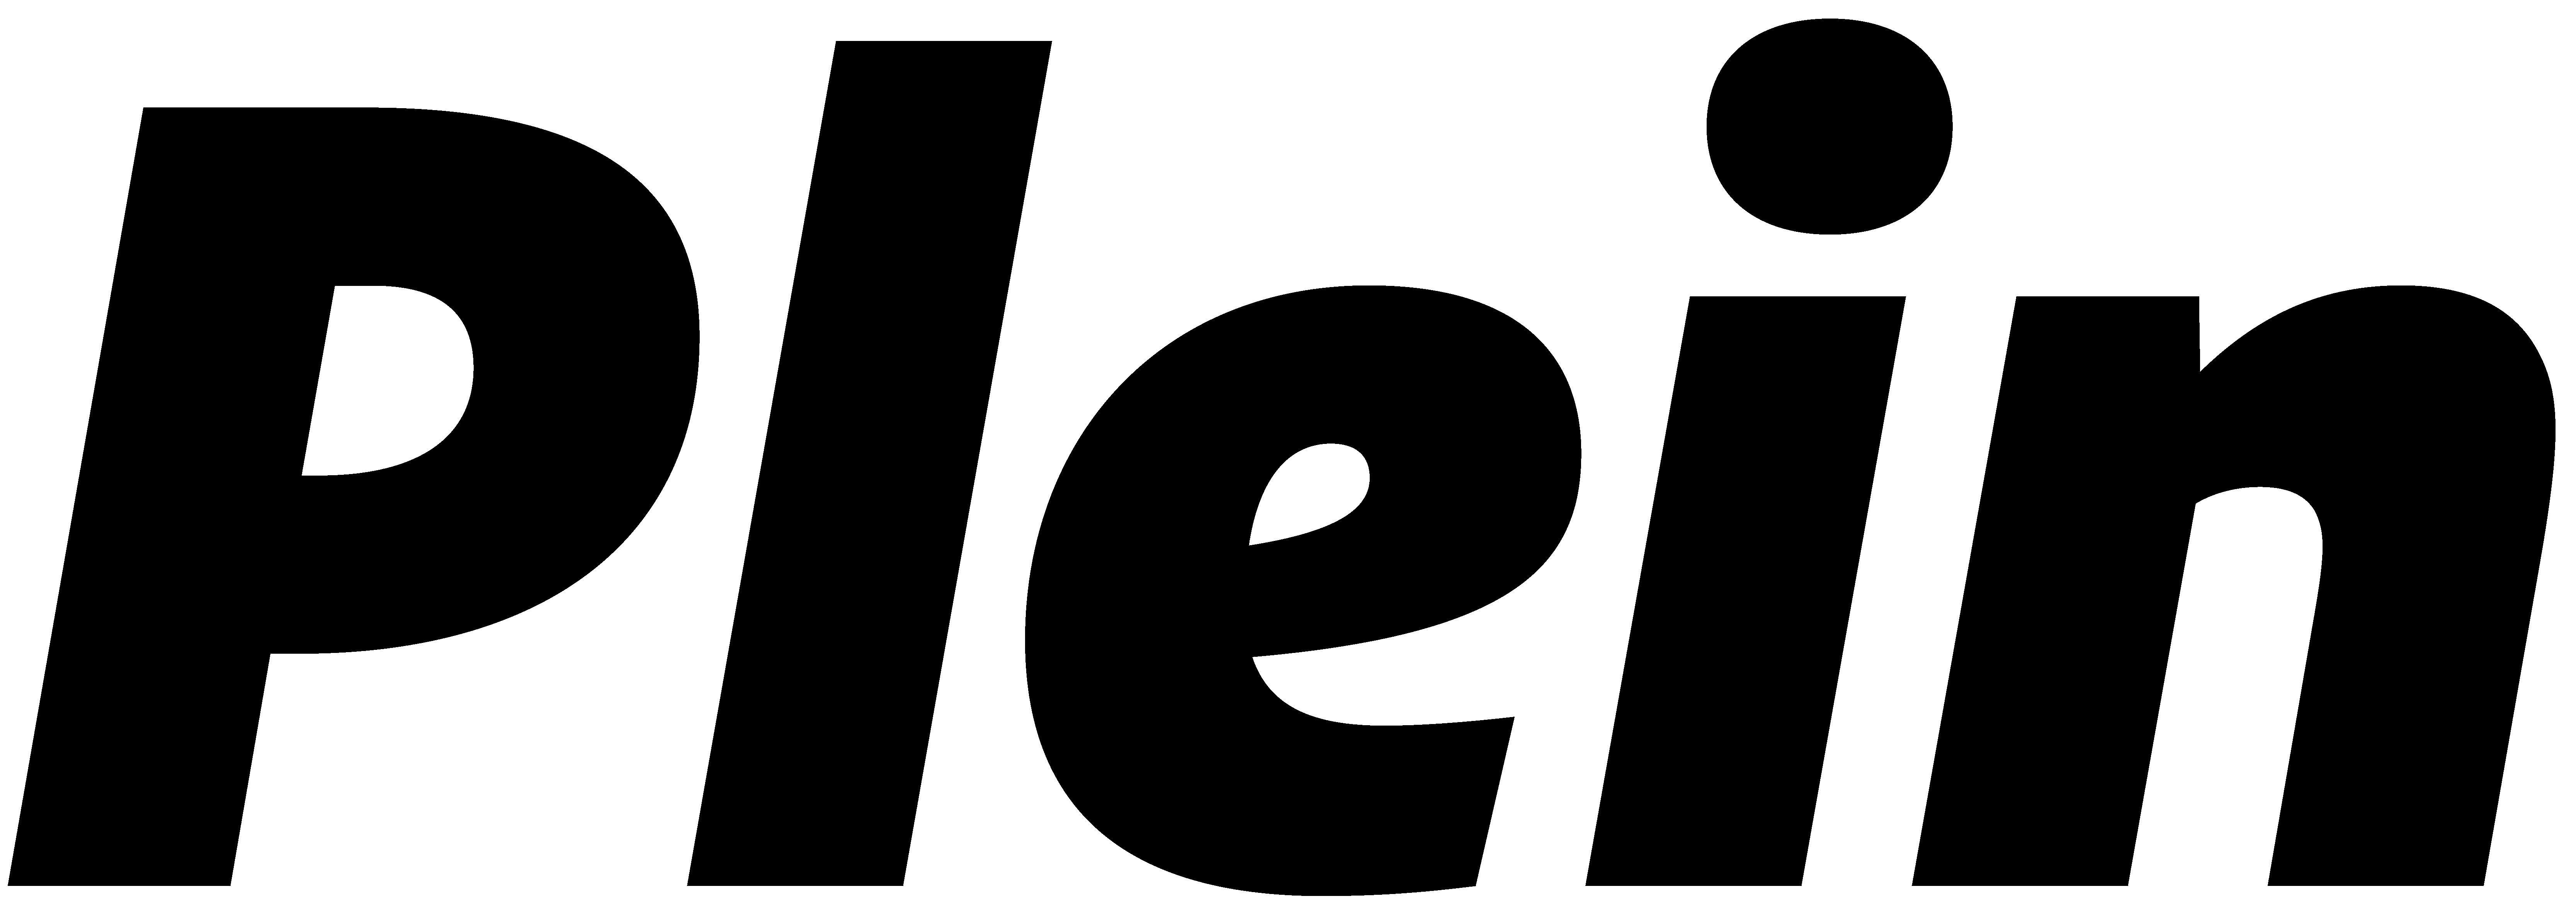 Inga Plönnigs, type design Portfolio